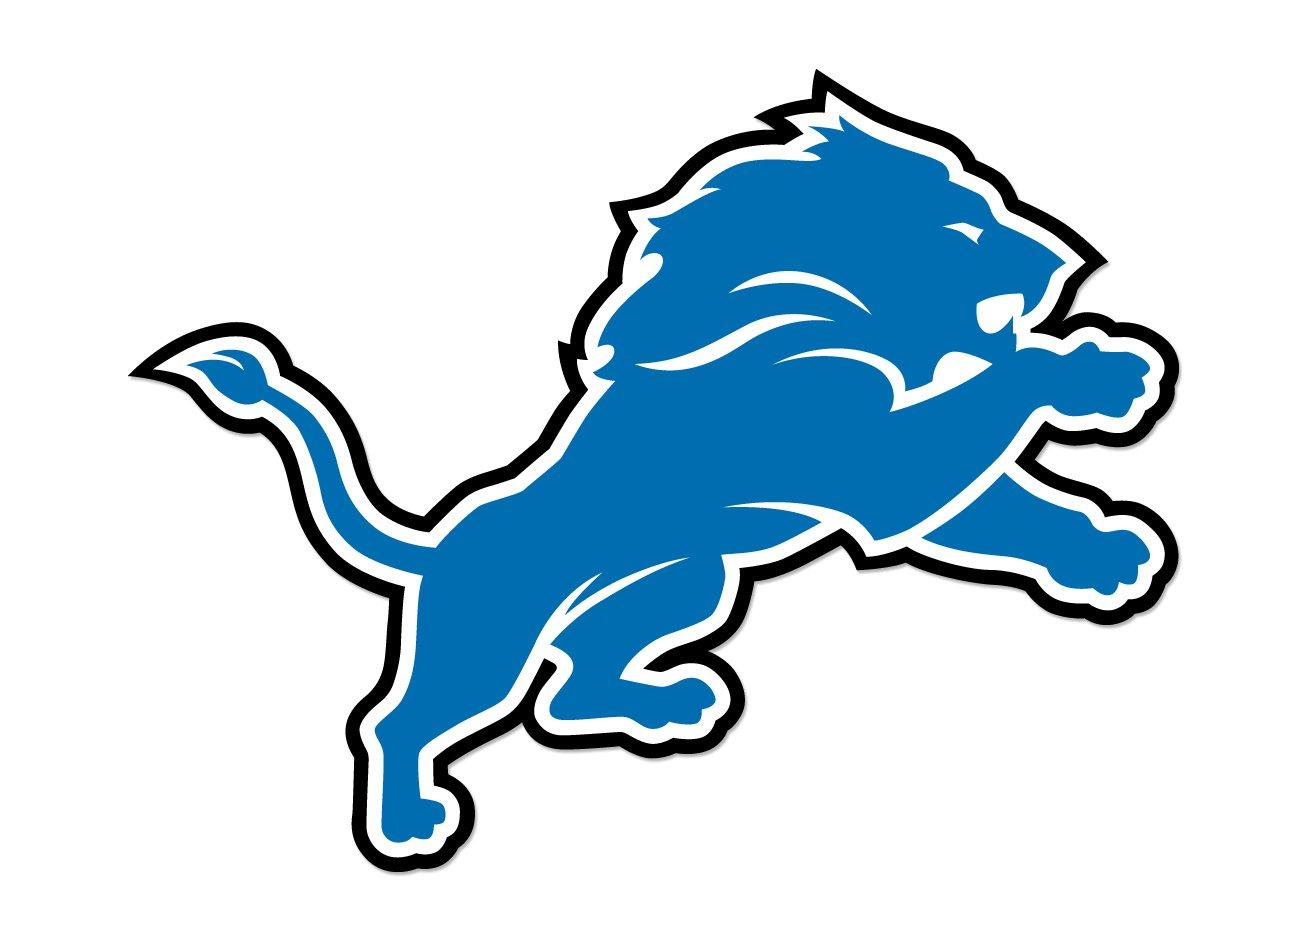 detroit lions logo  detroit lions symbol  meaning  history Dallas Cowboys Logo Stencil Dallas Cowboys Logo Stencil